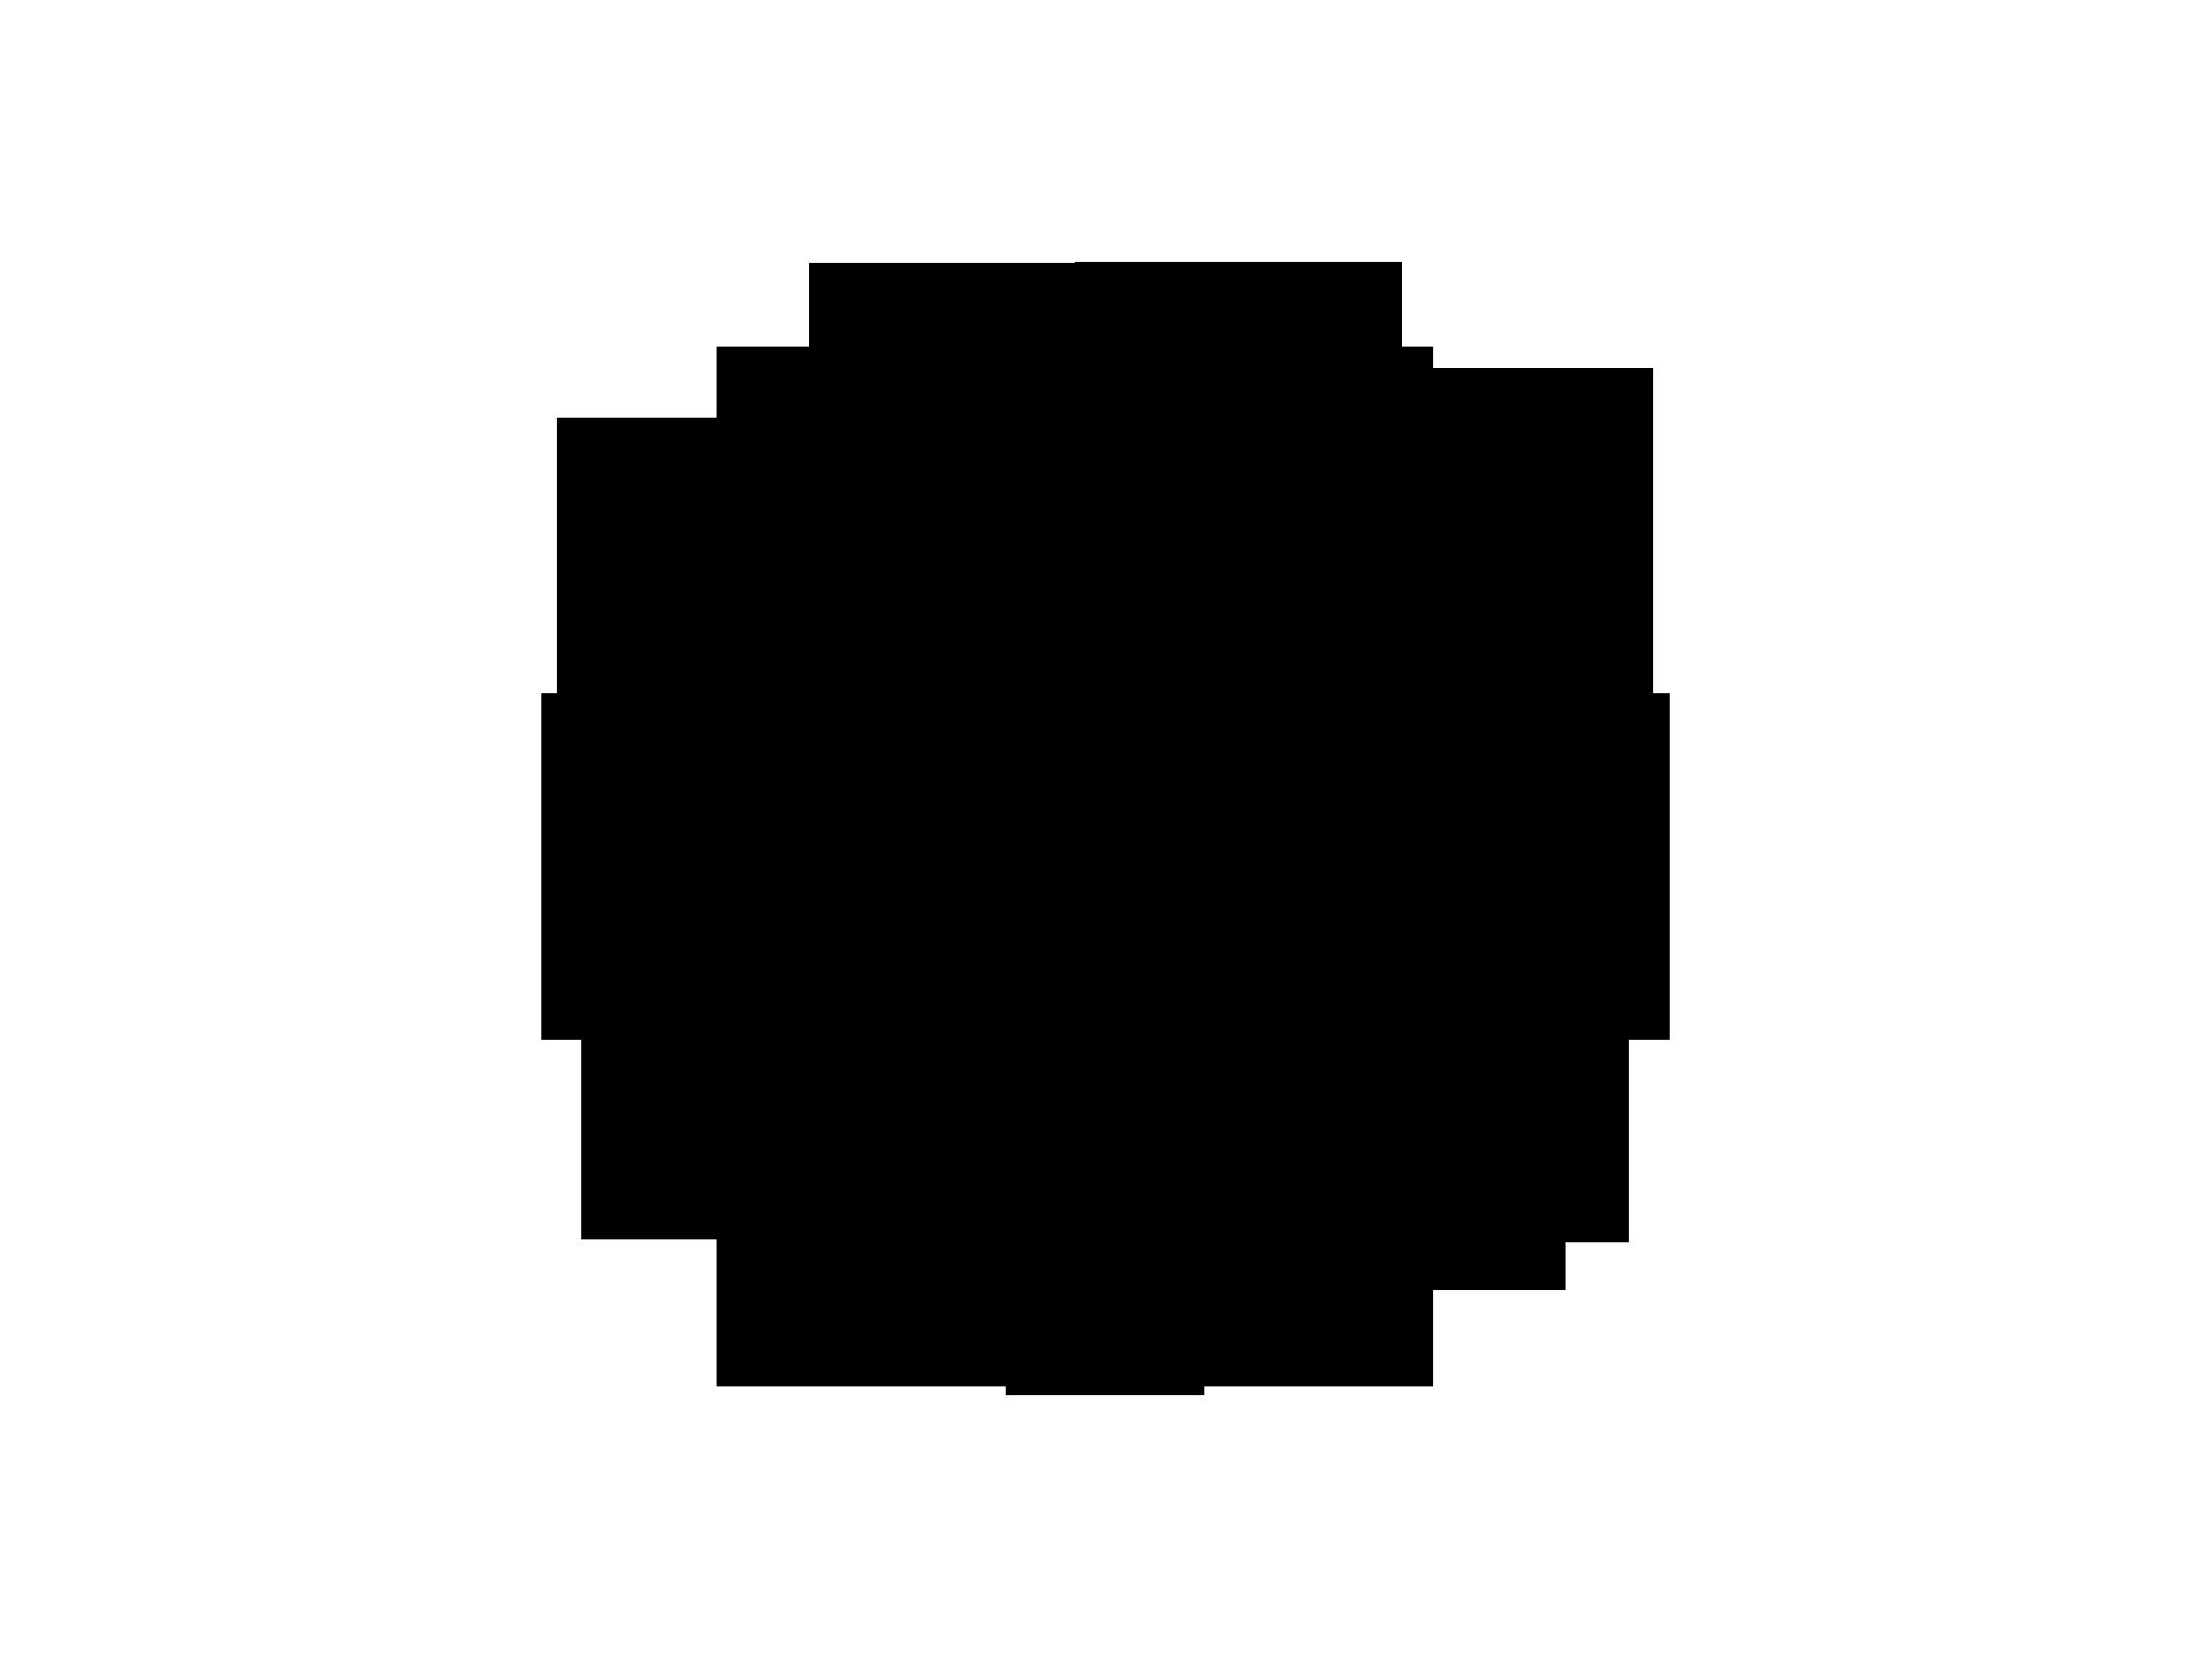 news-abc-png-logo-3.png